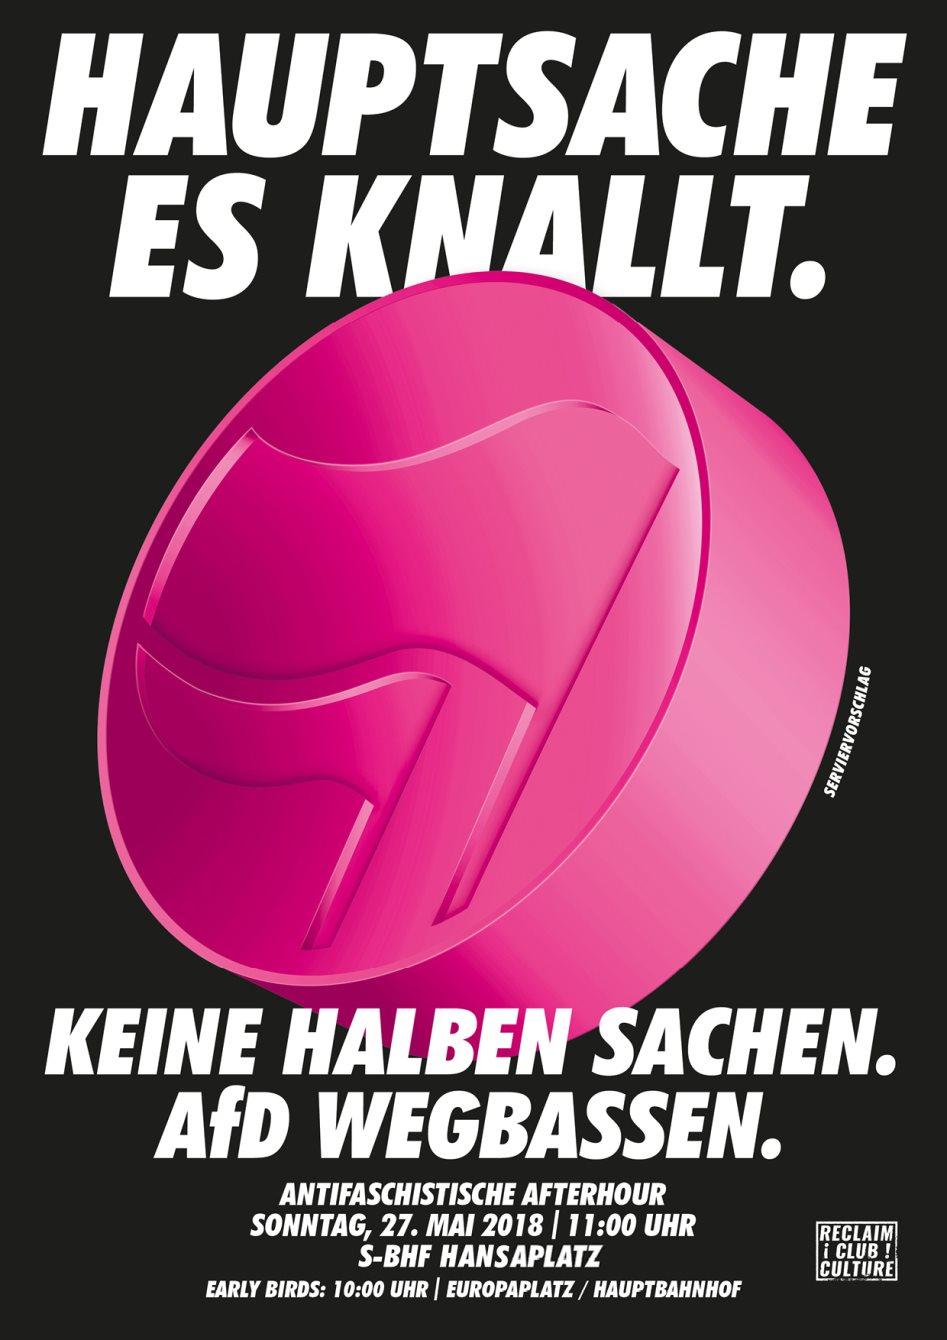 AfD Wegbassen - Berlin Against Nazis - Flyer front